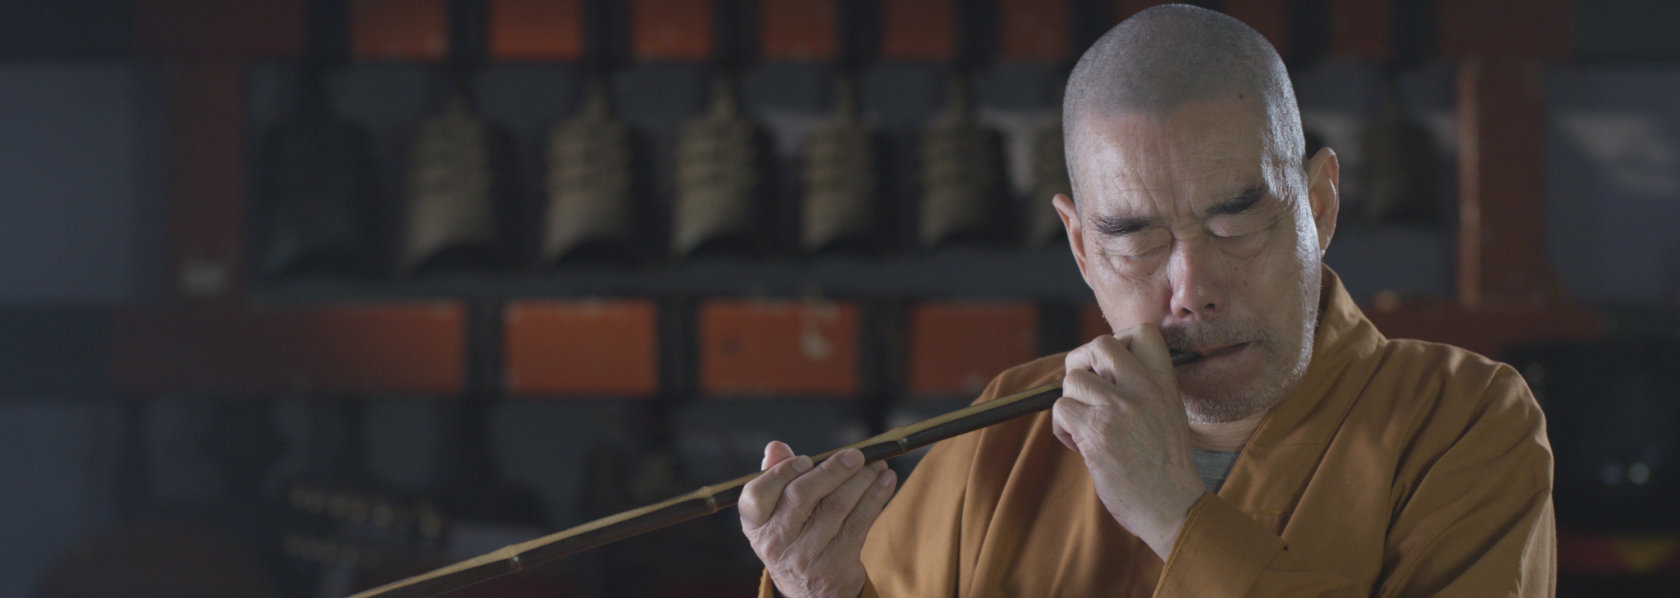 Elderly monk playing wind instrument - Music Monks - THIS Buddhist Film Festival